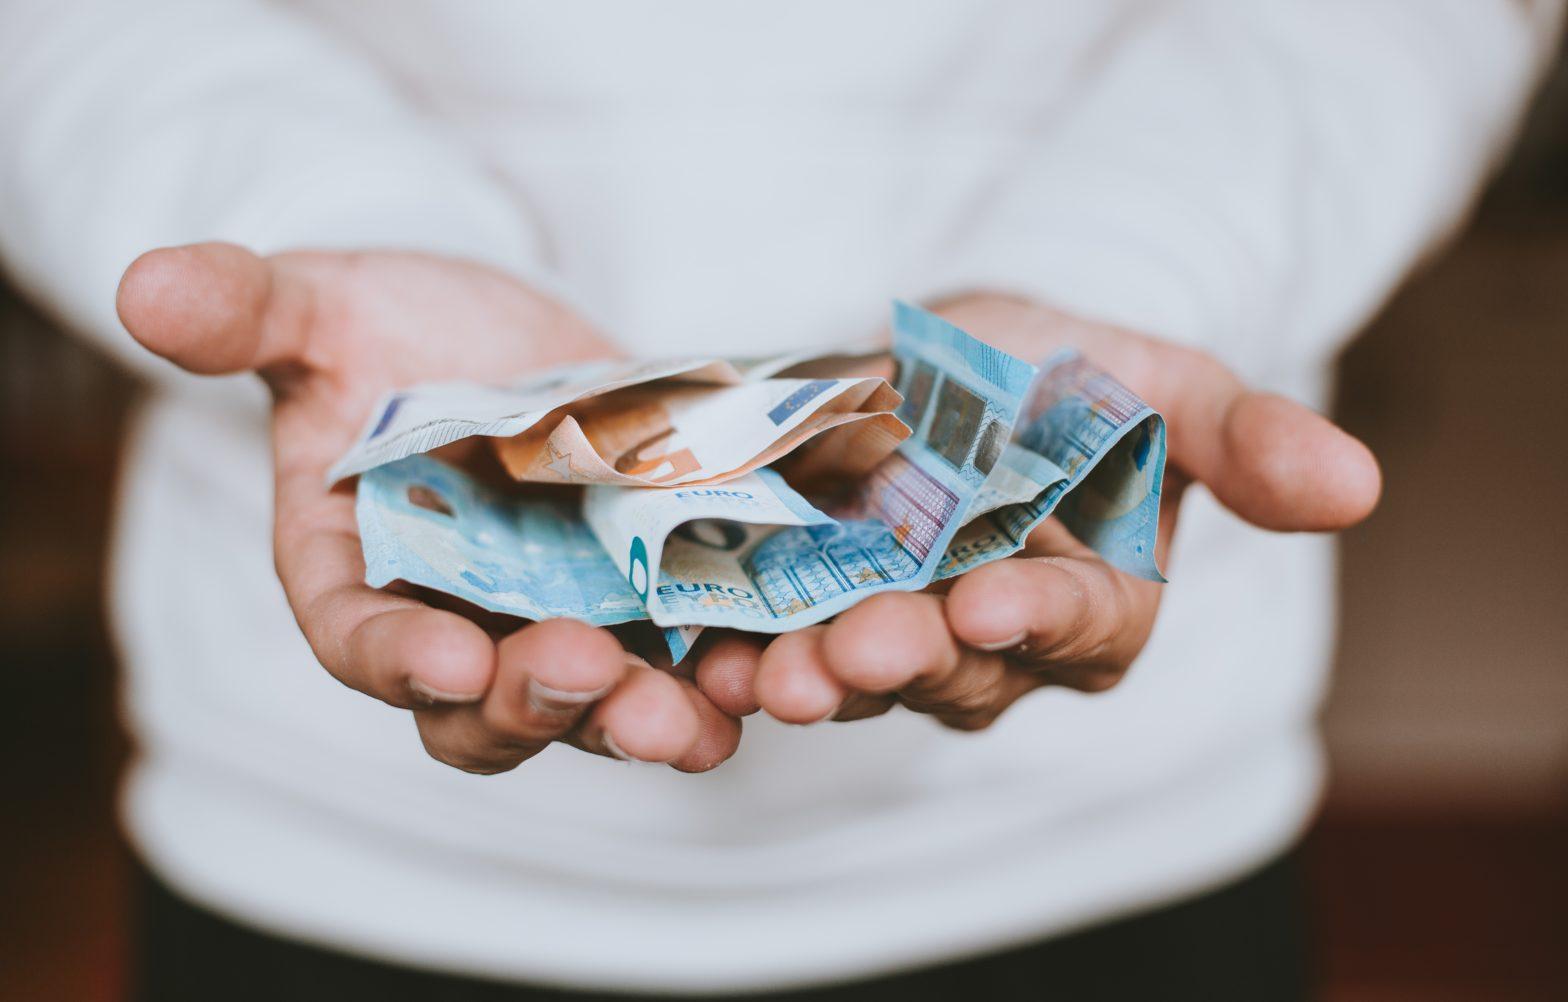 Eiro naudas banknotes cilvēka rokās